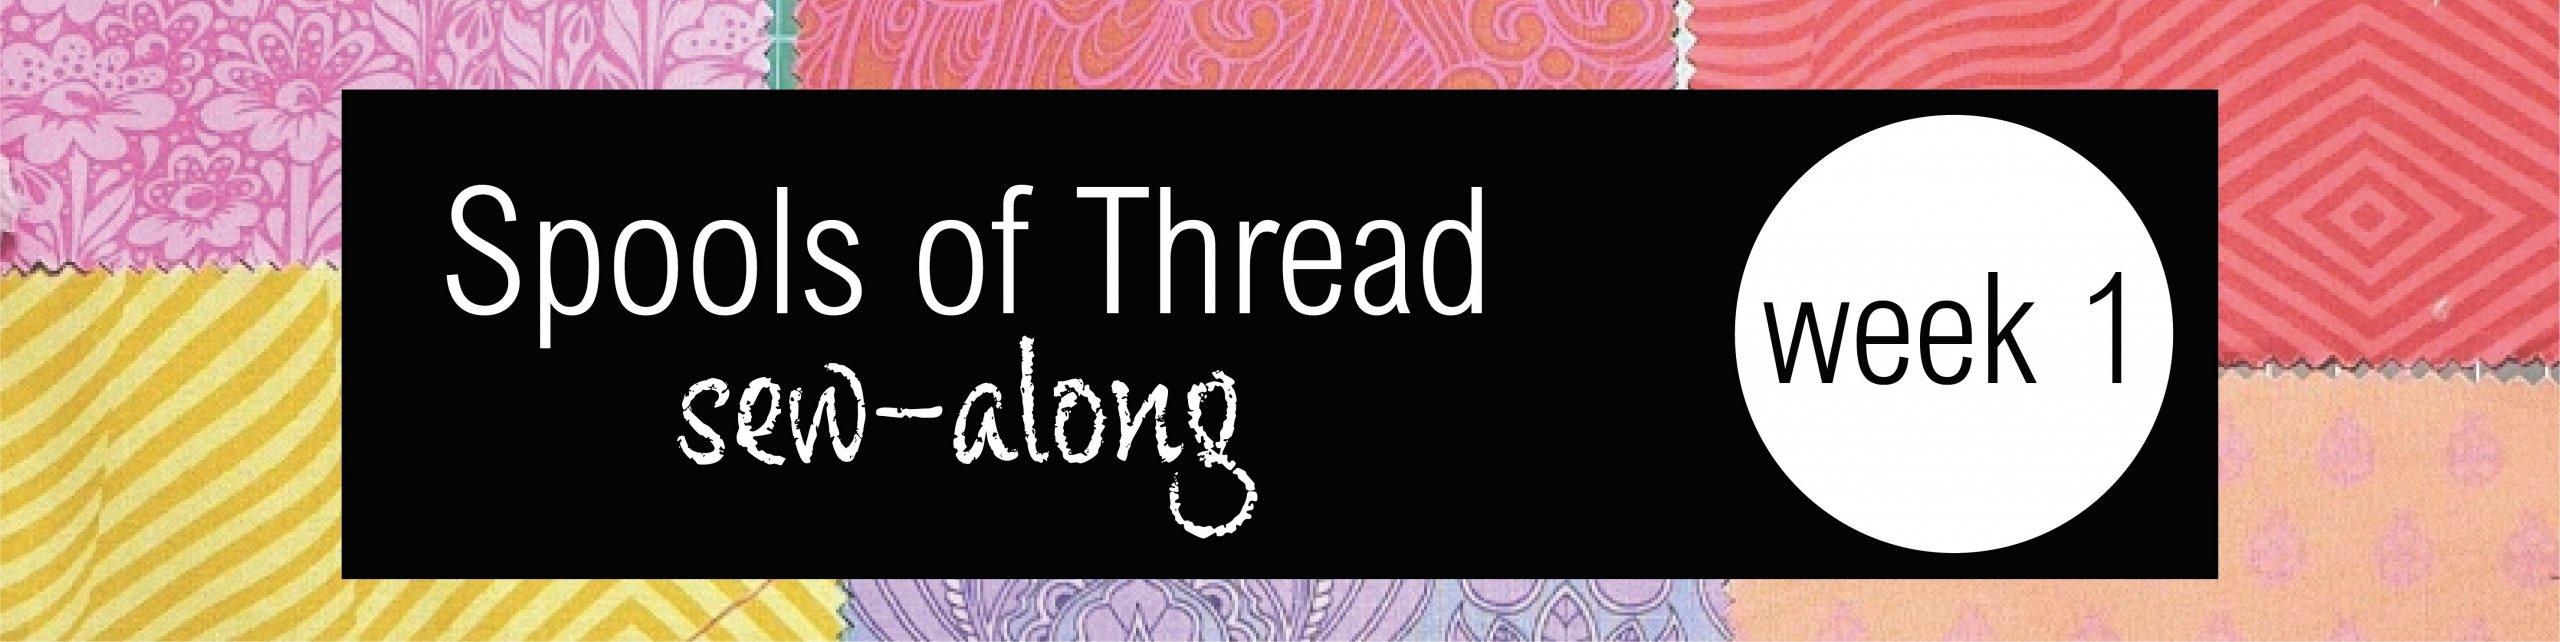 Spools of Thread Week 1 Sew Along